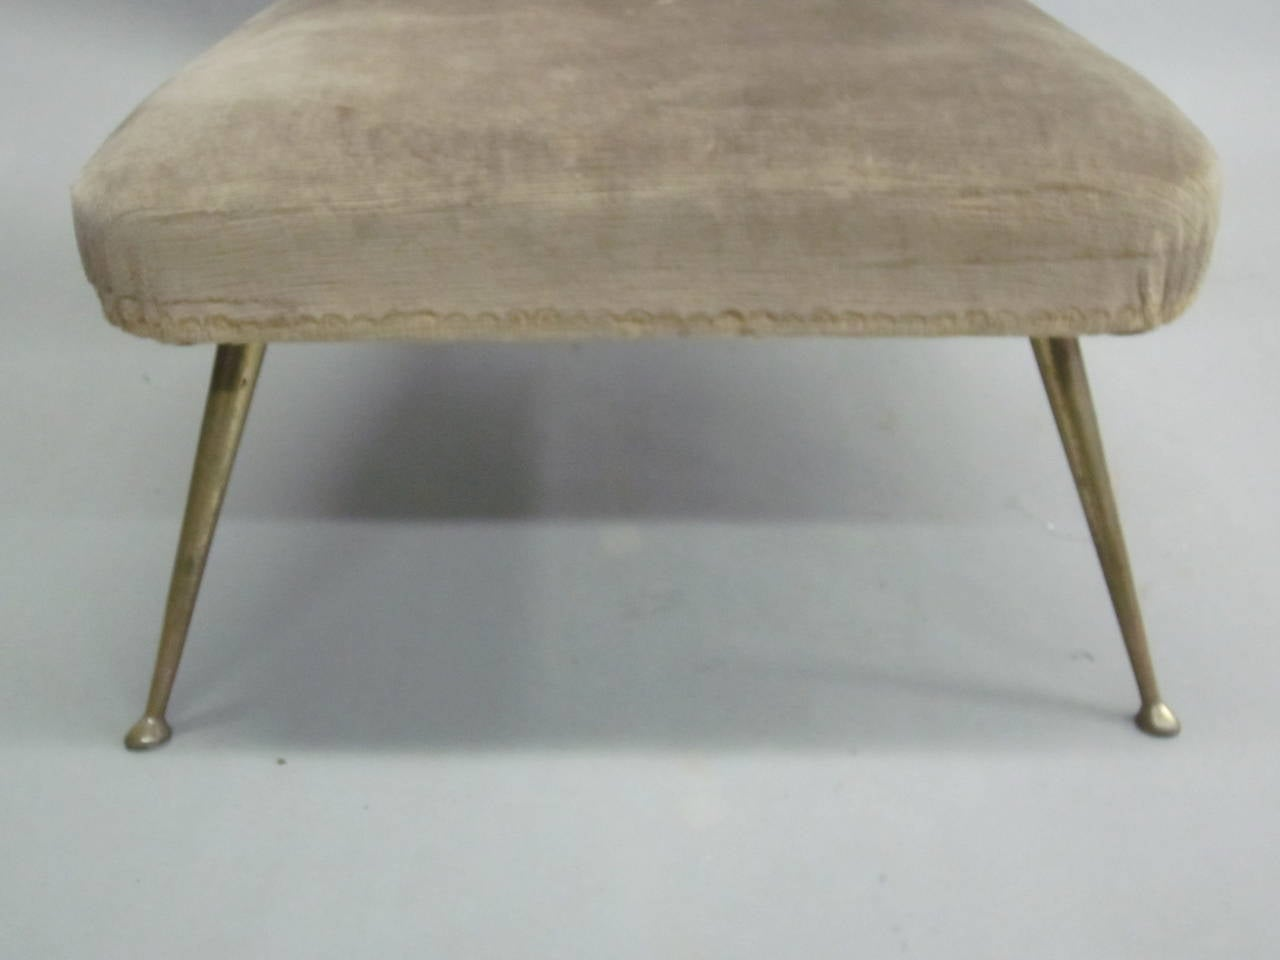 Pair of Italian Mid-Century Slipper Chairs Attributed to Marco Zanuso 8